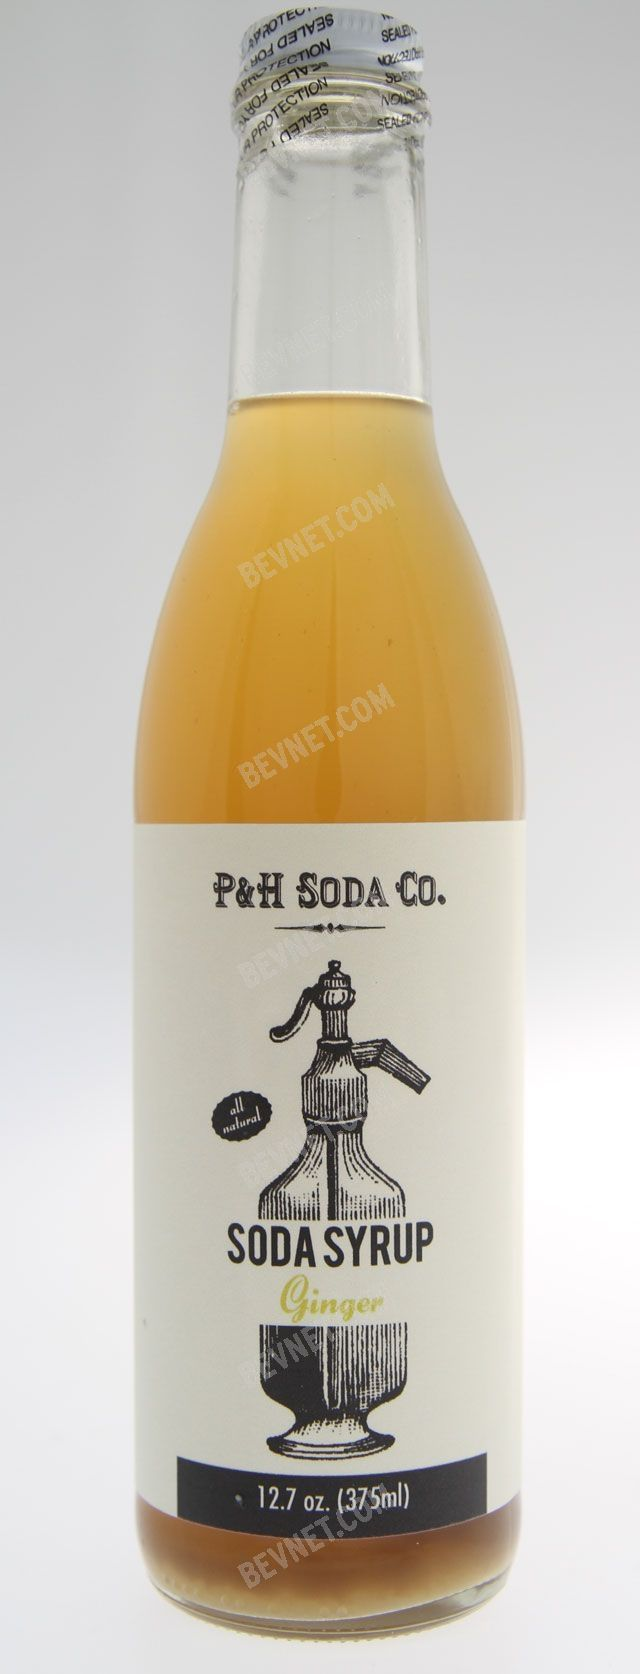 P&H Soda Company: